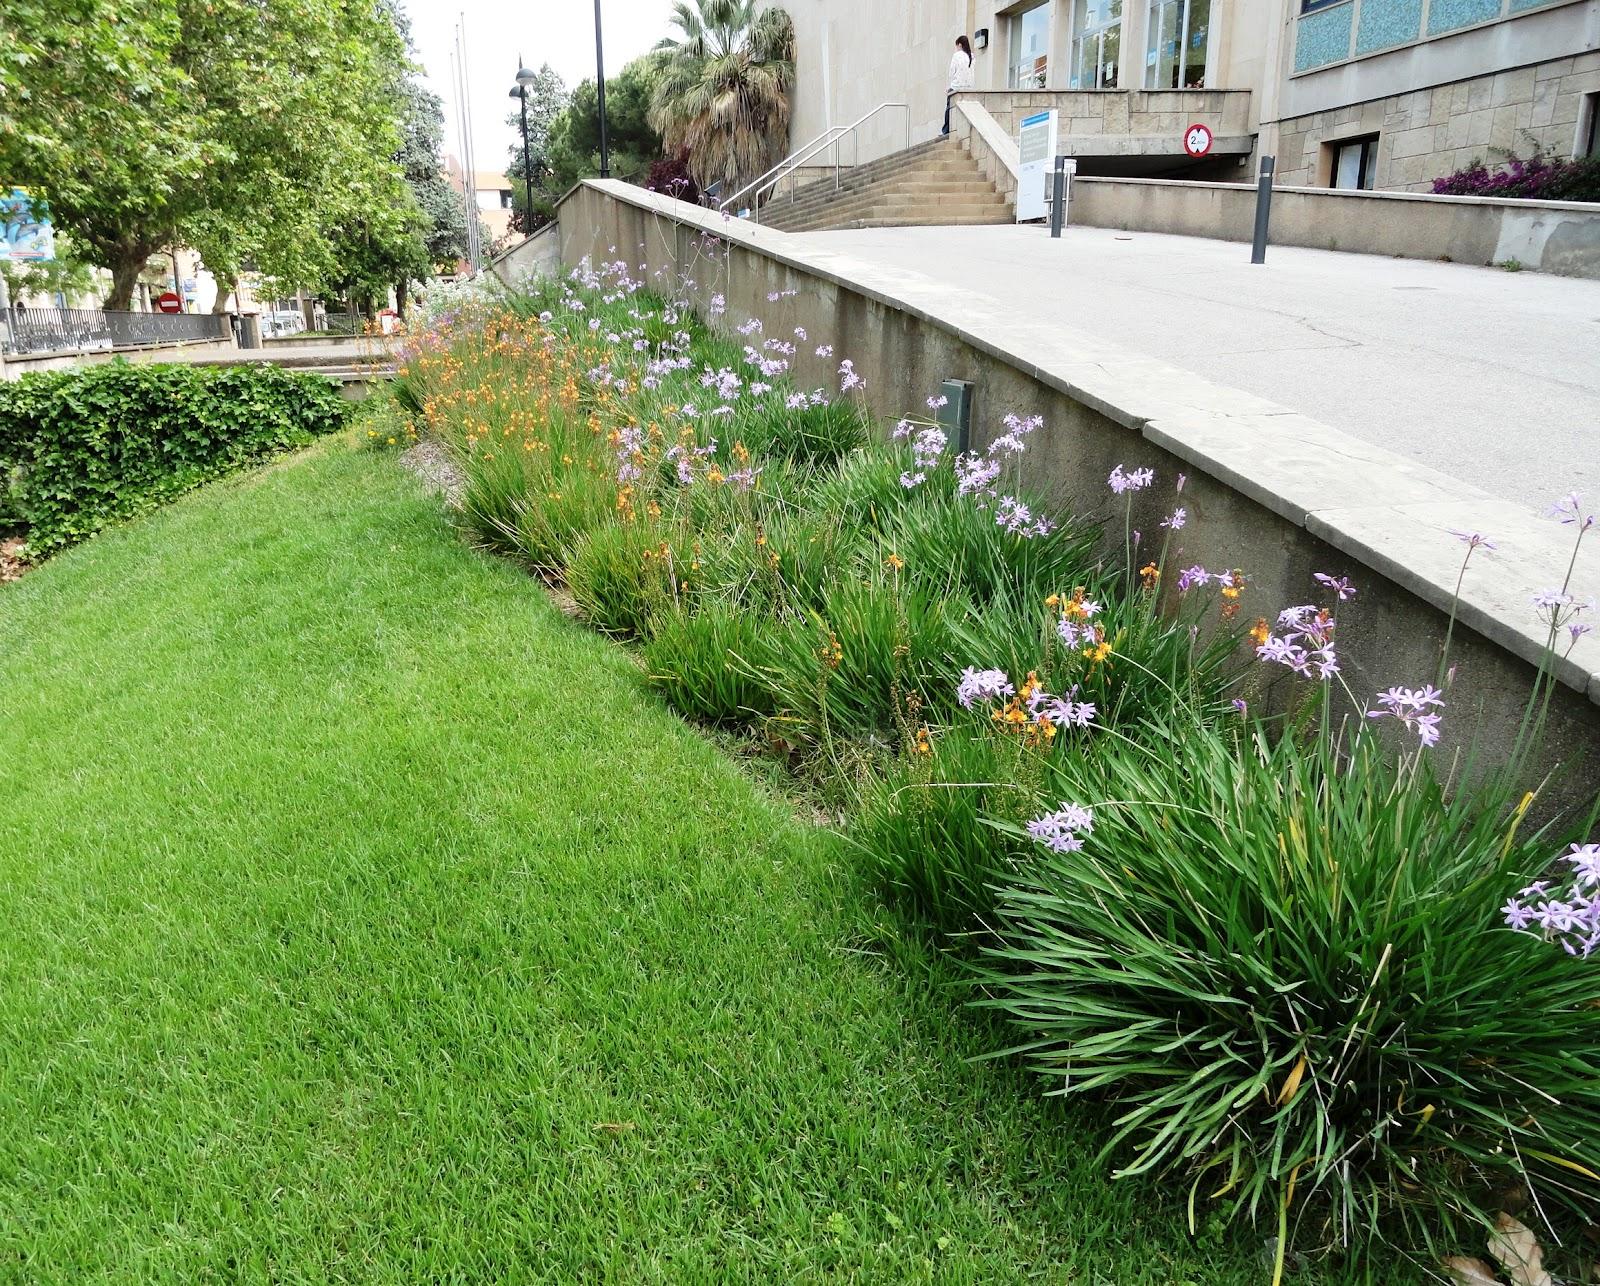 Paisatges i jardins landscapes and gardens jard - Garden terrassa ...